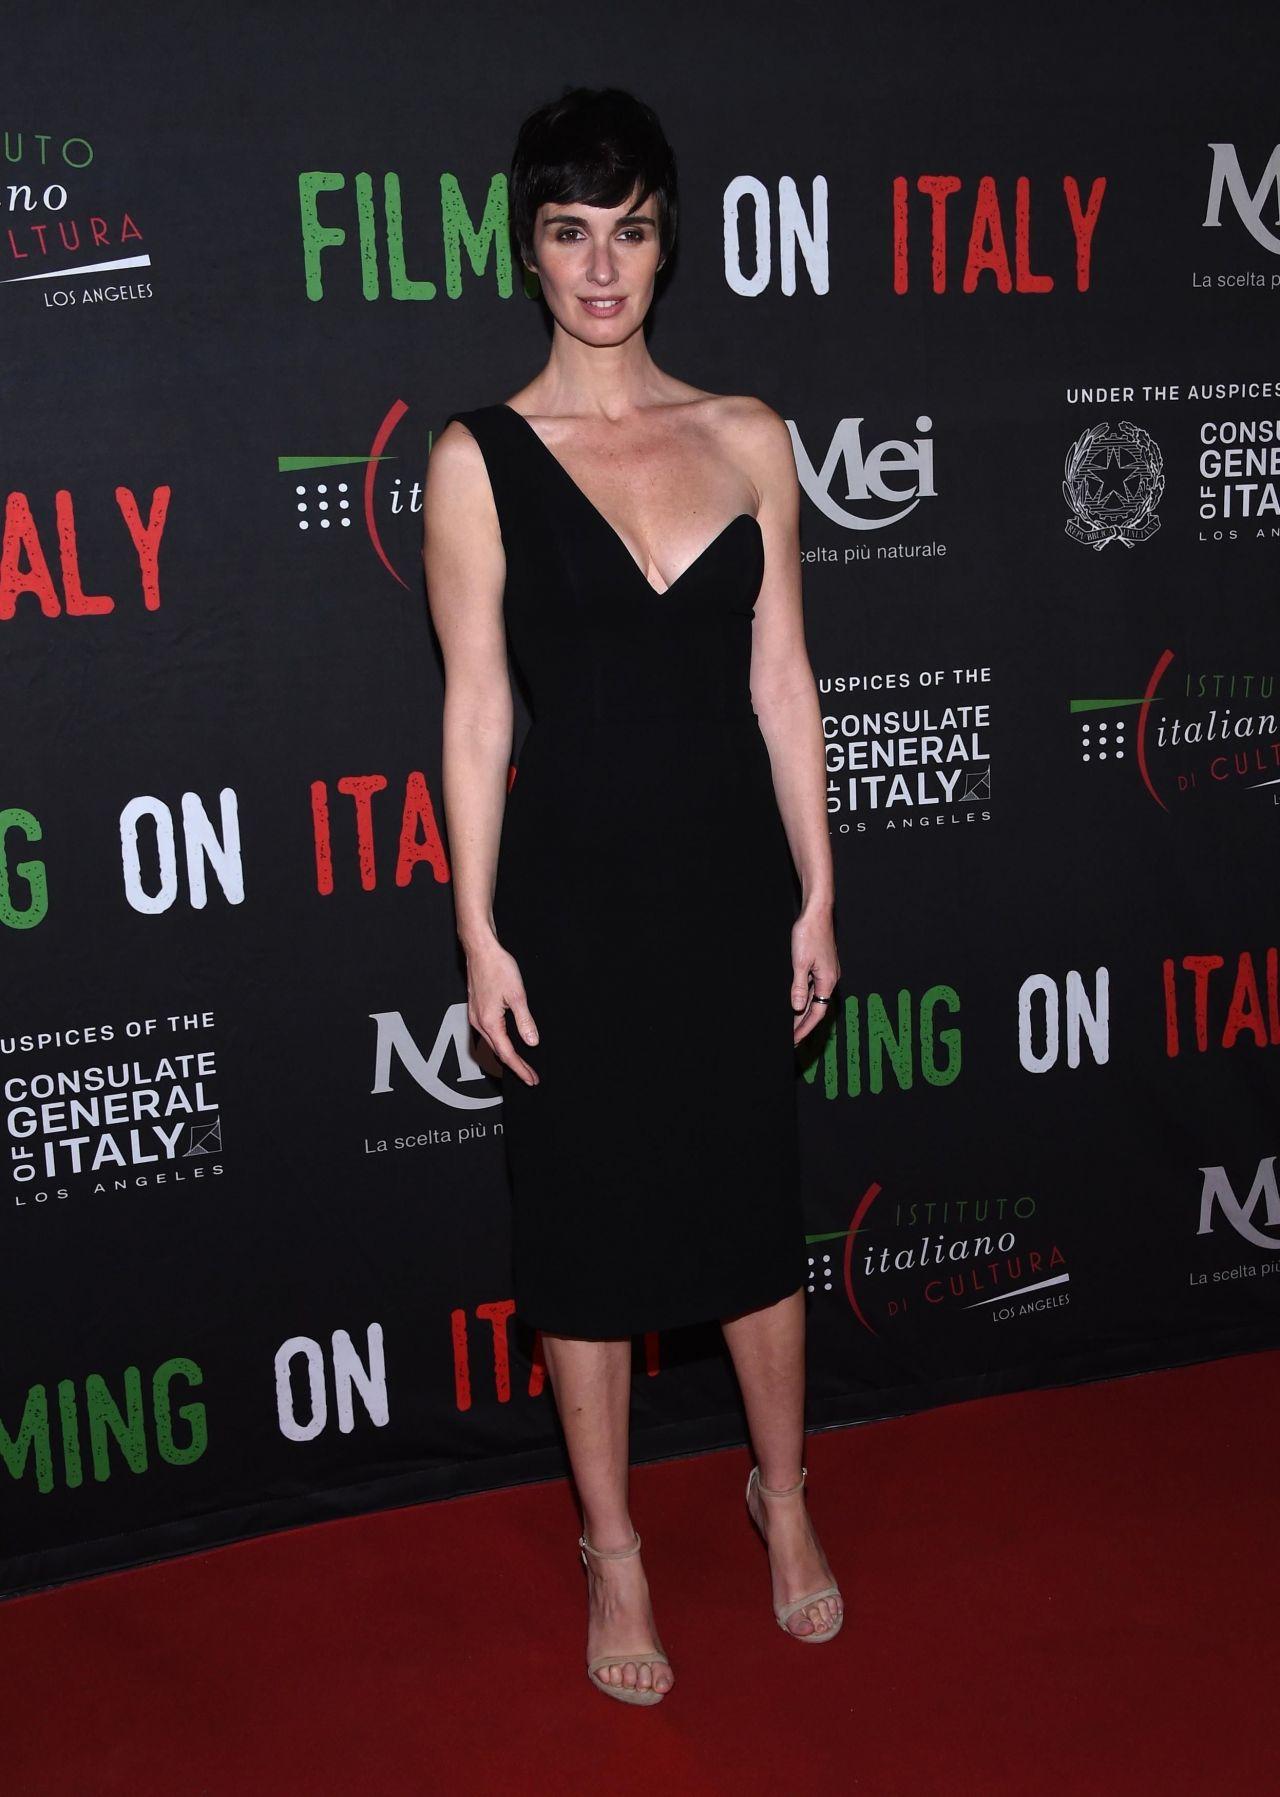 http://celebmafia.com/wp-content/uploads/2018/02/paz-vega-italian-institute-of-culture-los-angeles-creativity-awards-2018-1.jpg